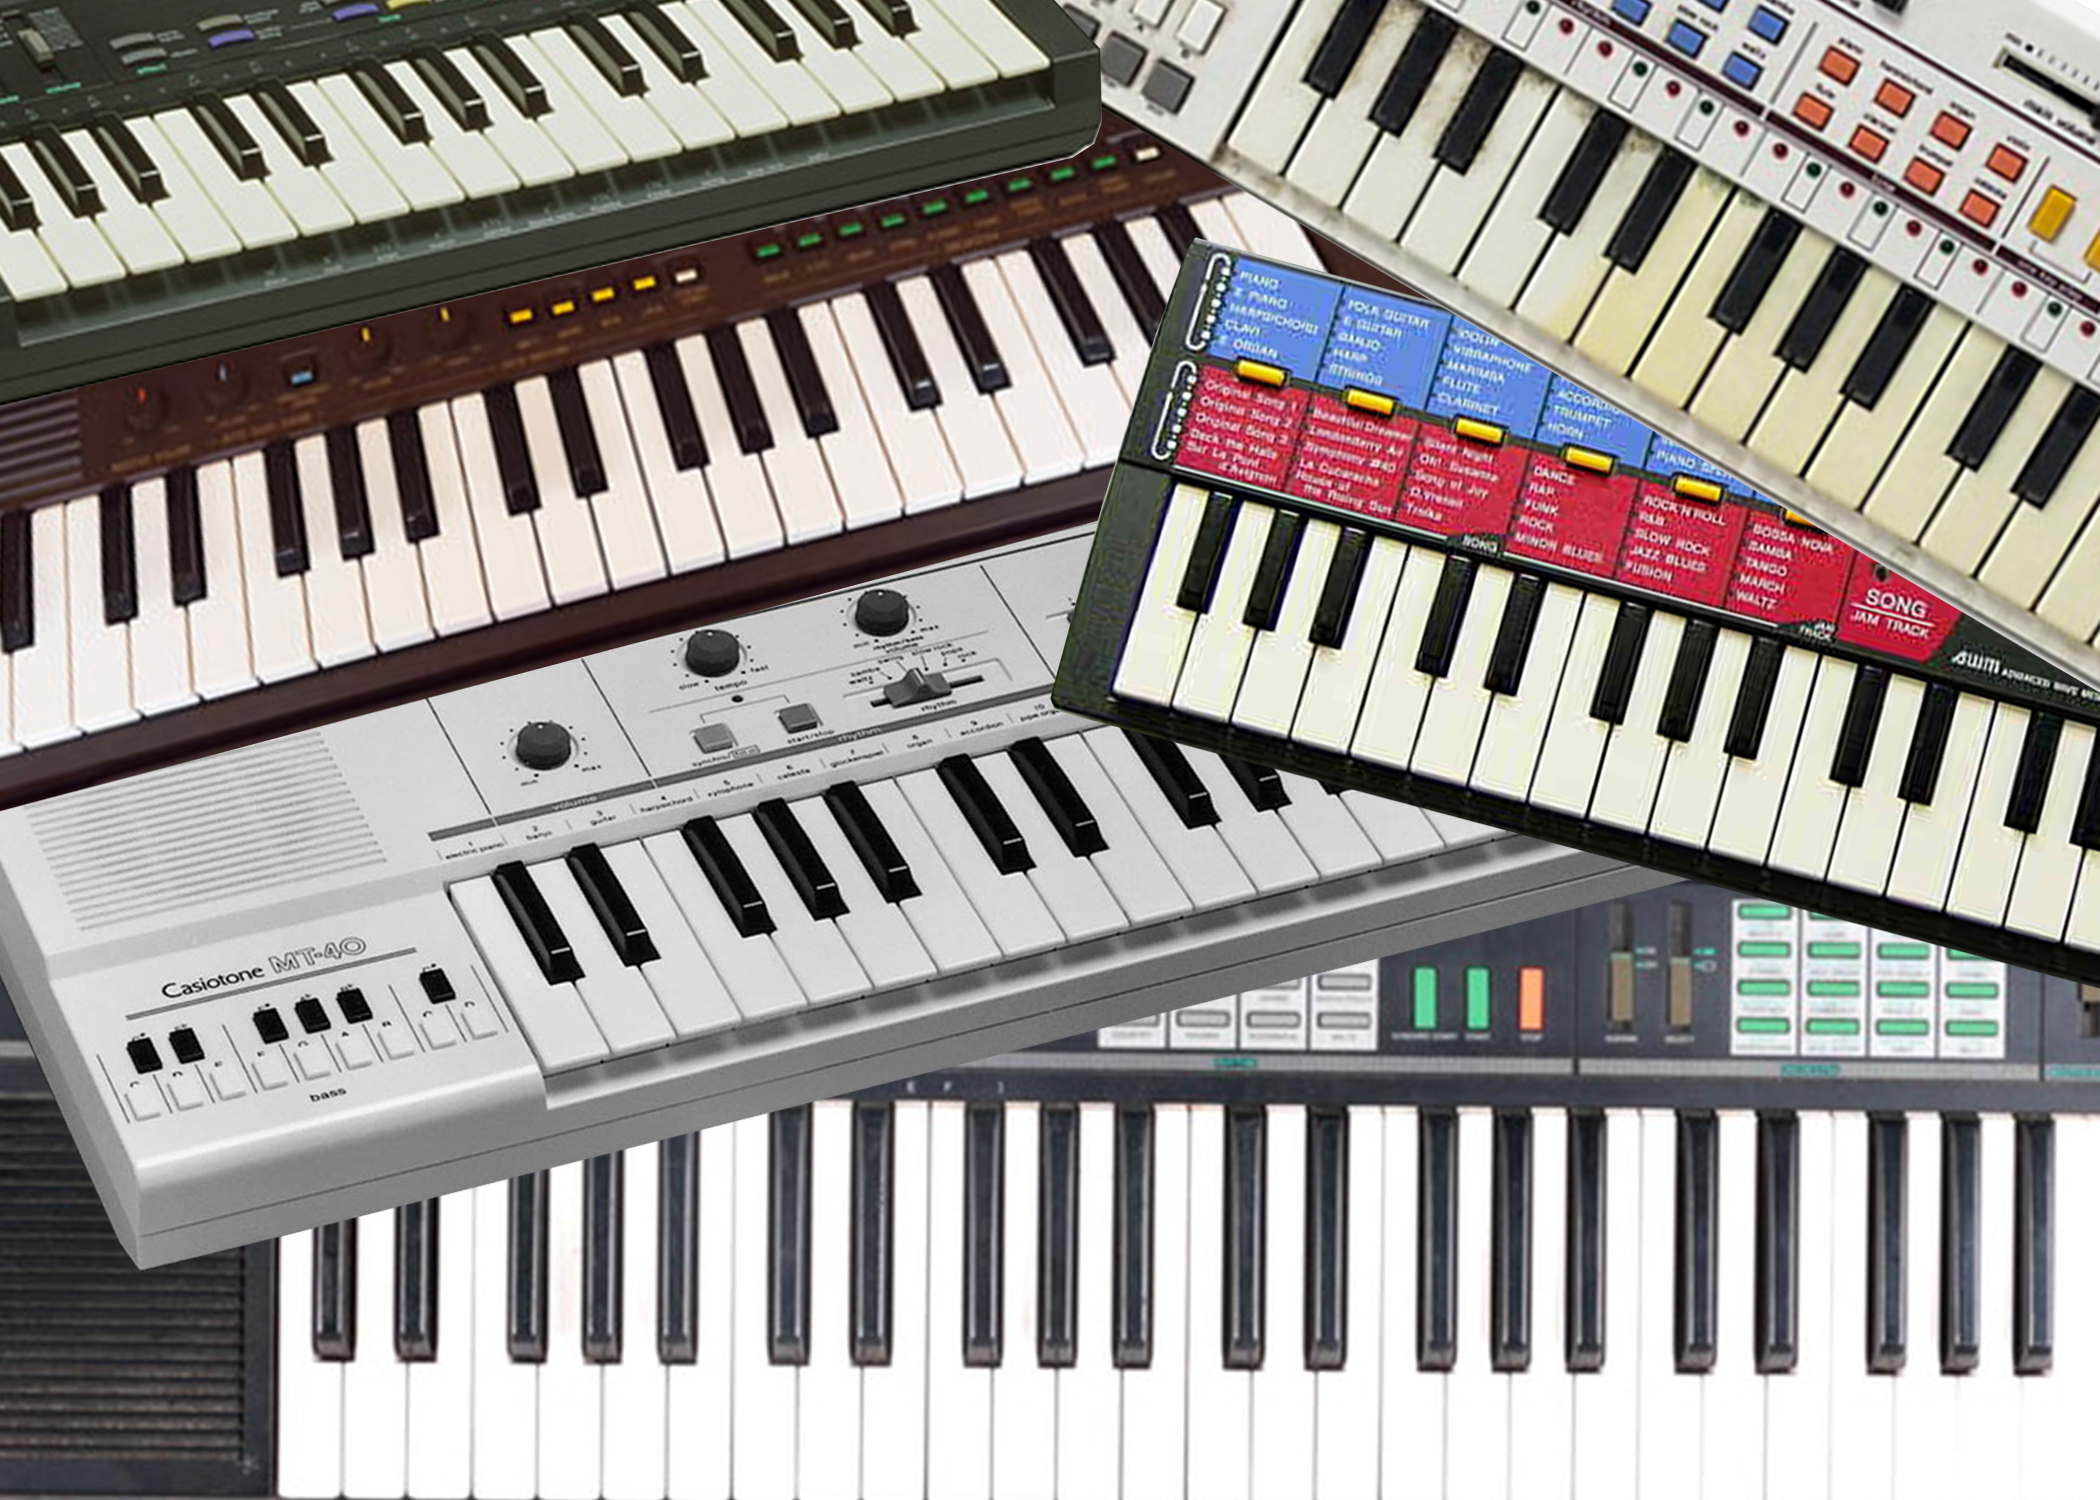 KeyboardsandSongwritingVisual.jpg